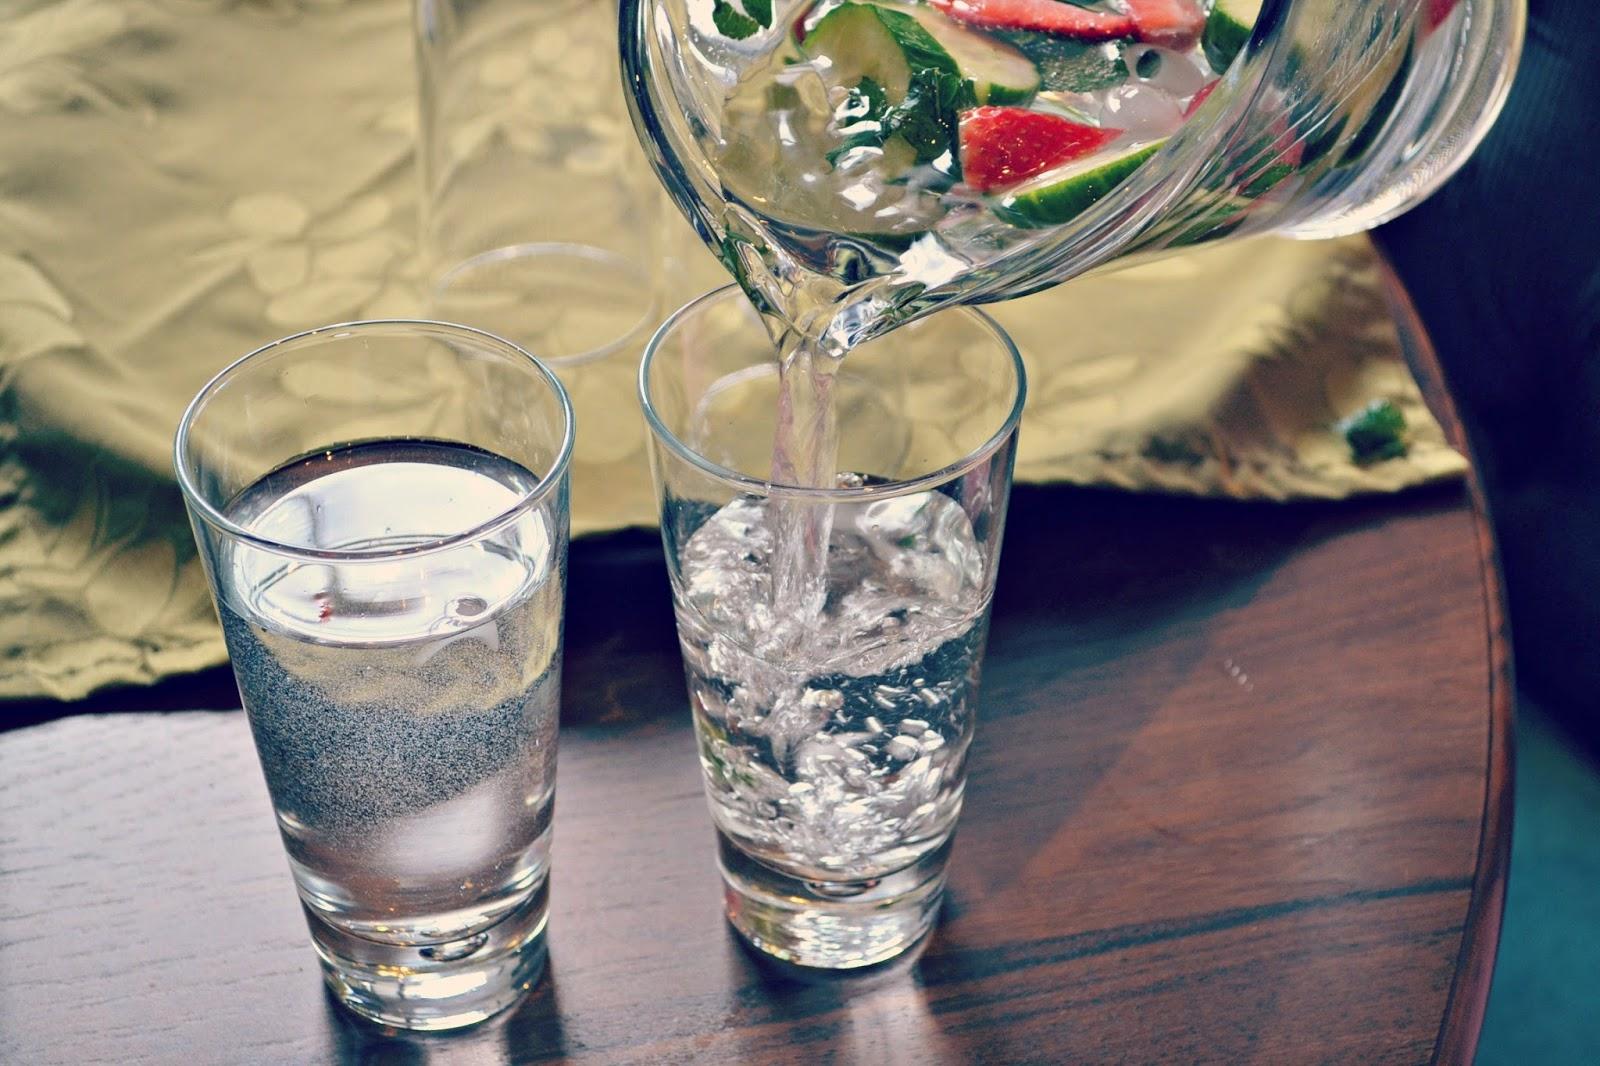 Blogger spa day at Harington House fruit water